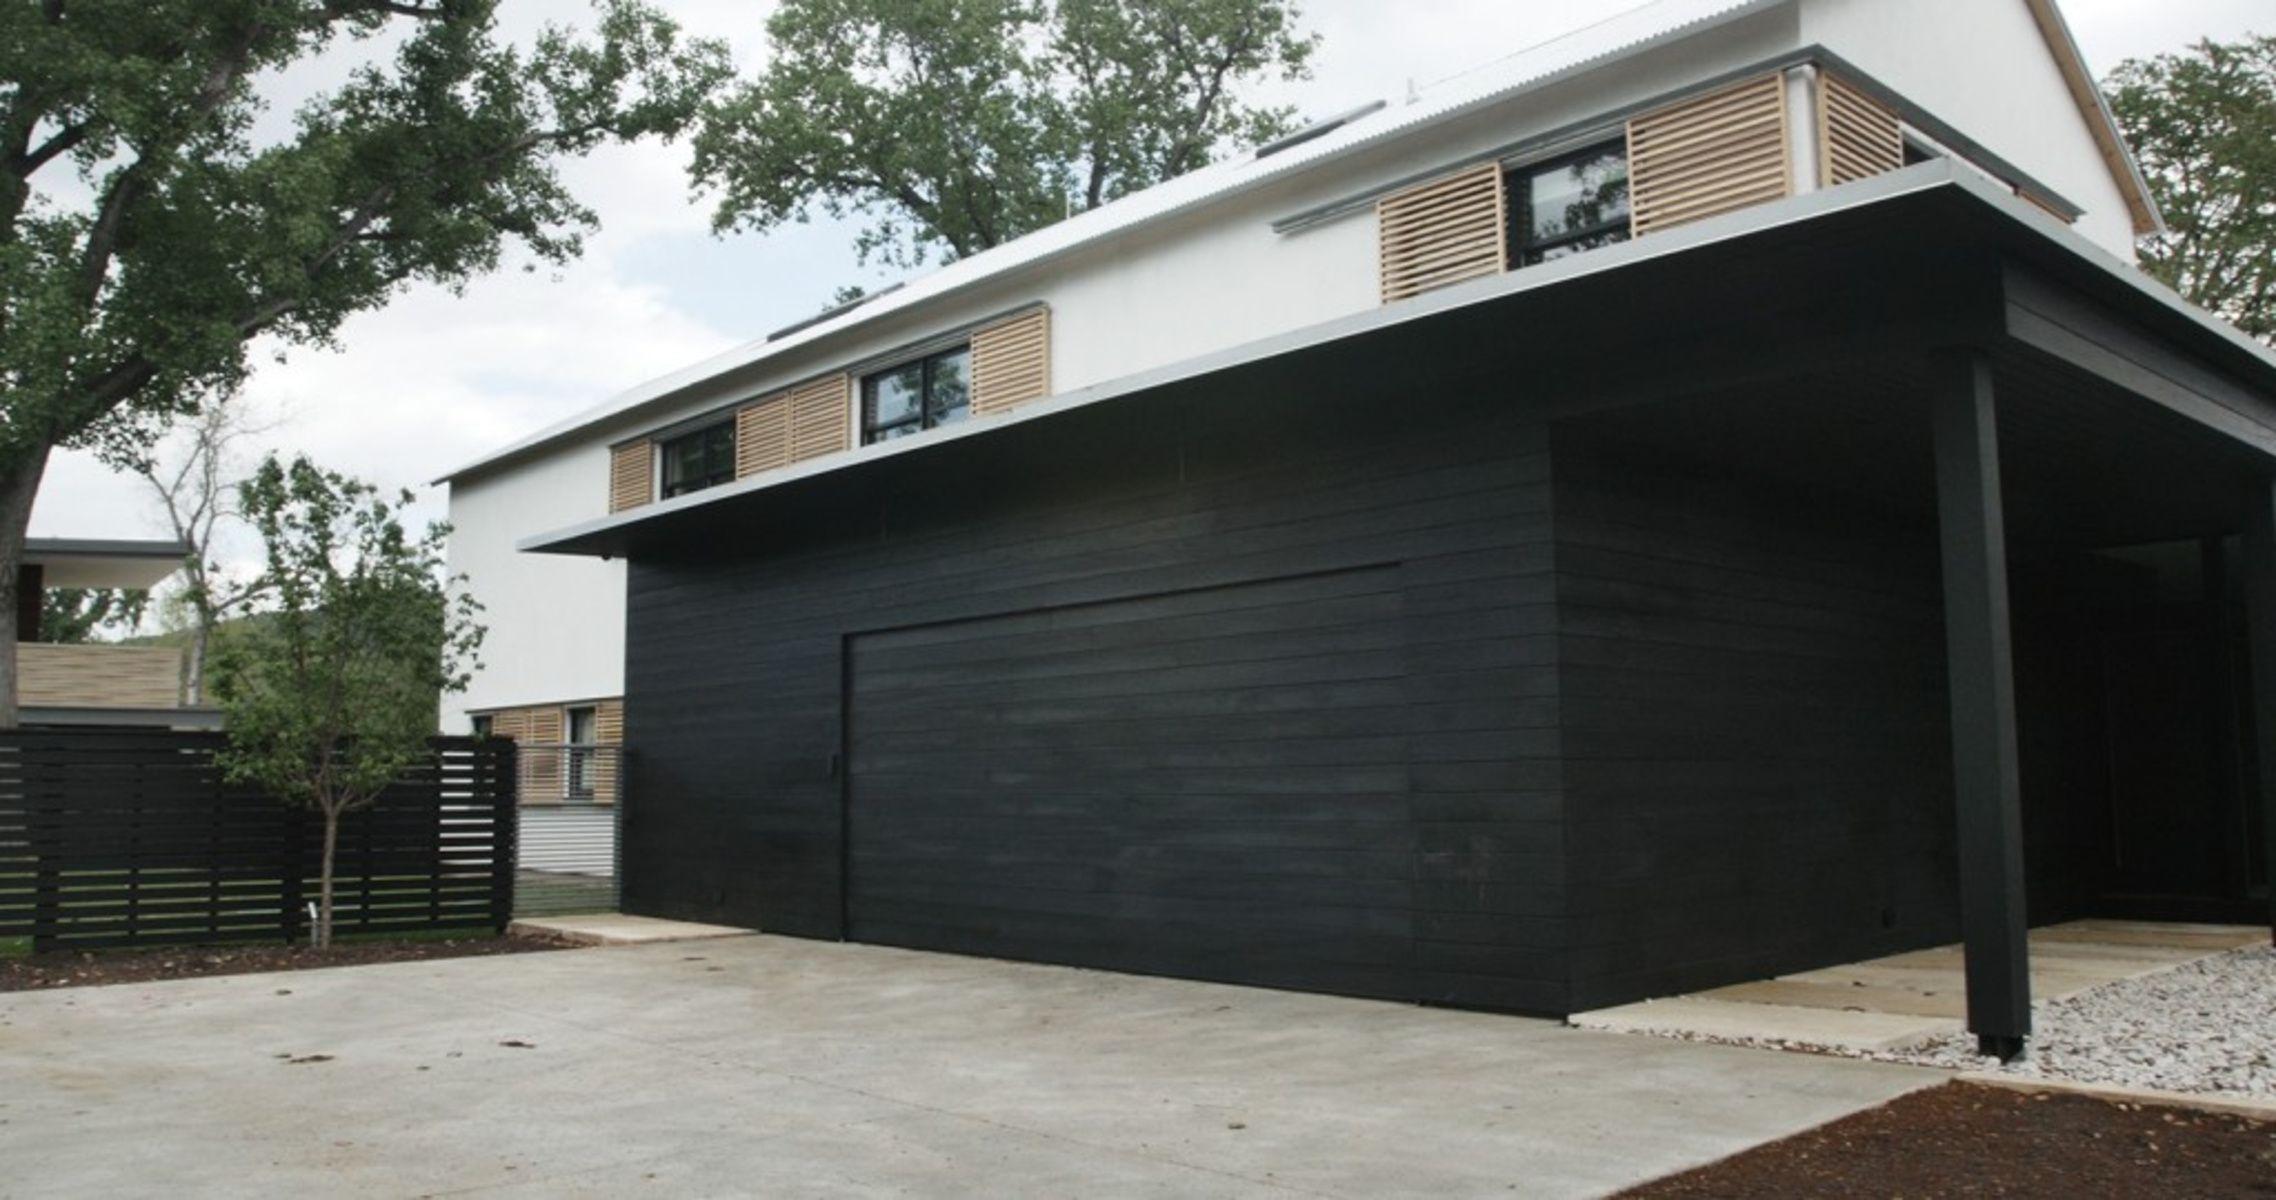 shou sugi ban wood architecture pinterest. Black Bedroom Furniture Sets. Home Design Ideas